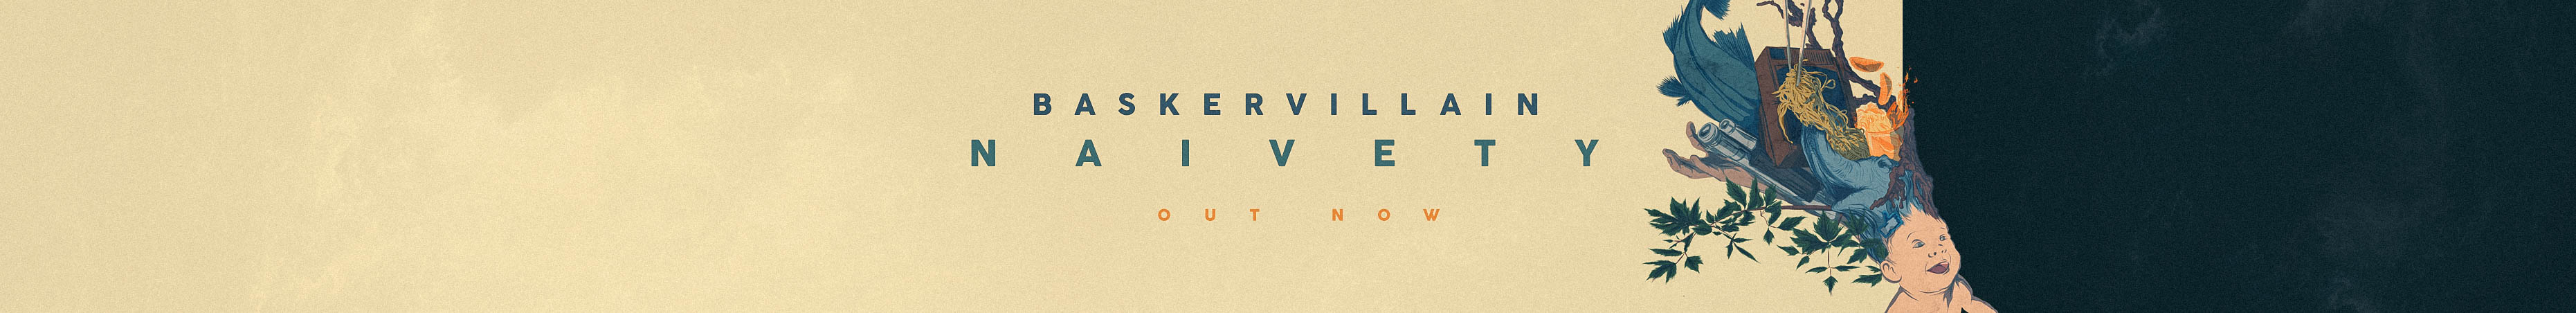 Baskervillain_Naivety-banner